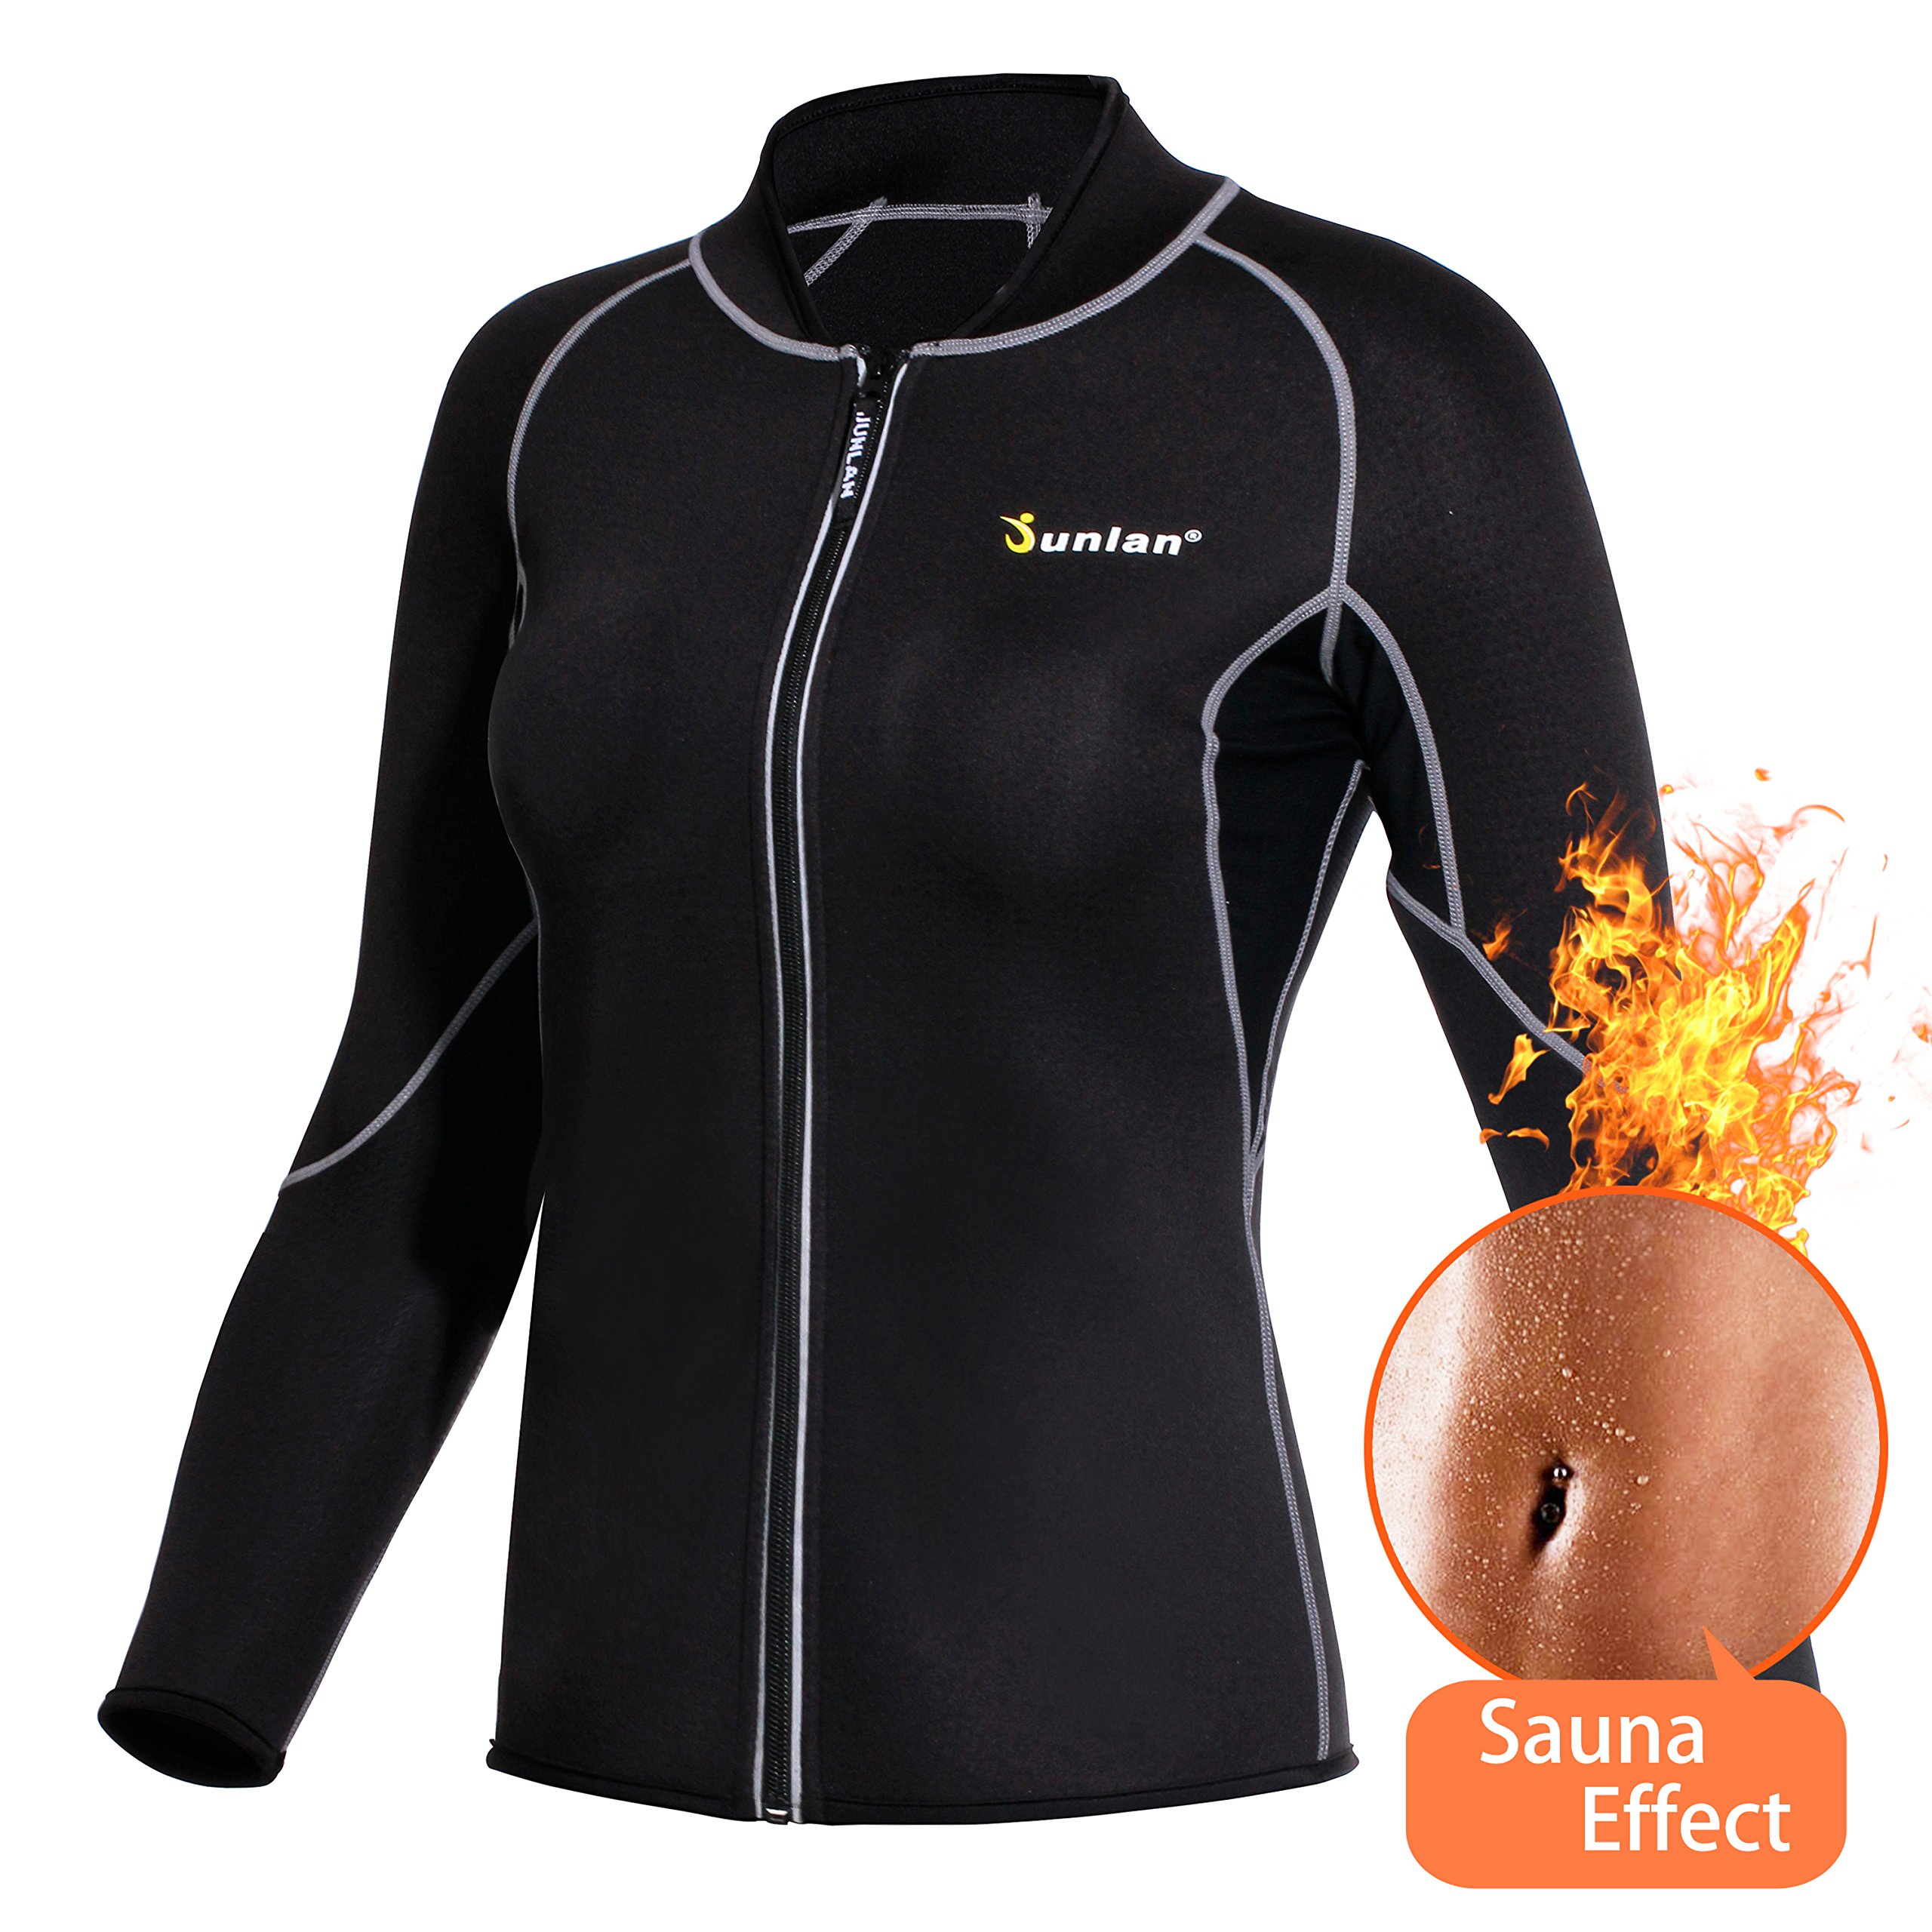 Junlan Neoprene Long Sleeves Sauna Shirt Top Weight Loss Hot Slimming Suit Workout Exercise Zipper Workout Shirt (Black Sauna Suit, S)